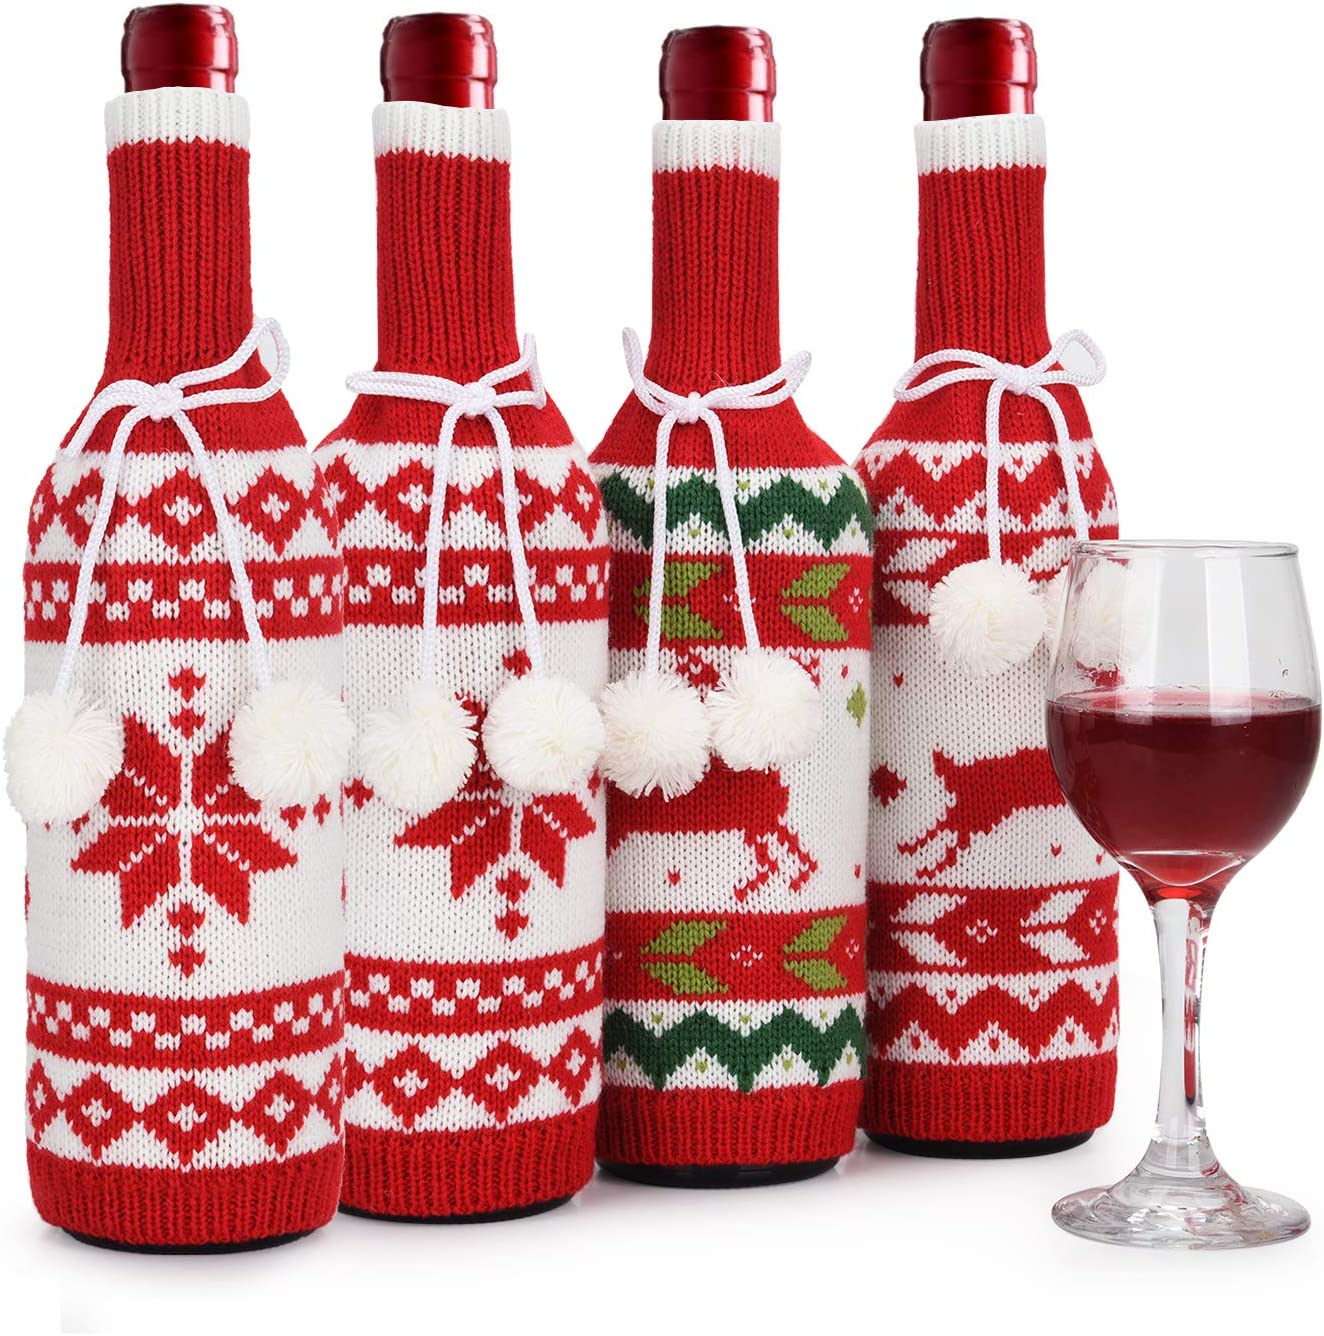 Handmade ChristmasTree Wine Bottle Beer Covers Bags Gift Bottle Decoration New